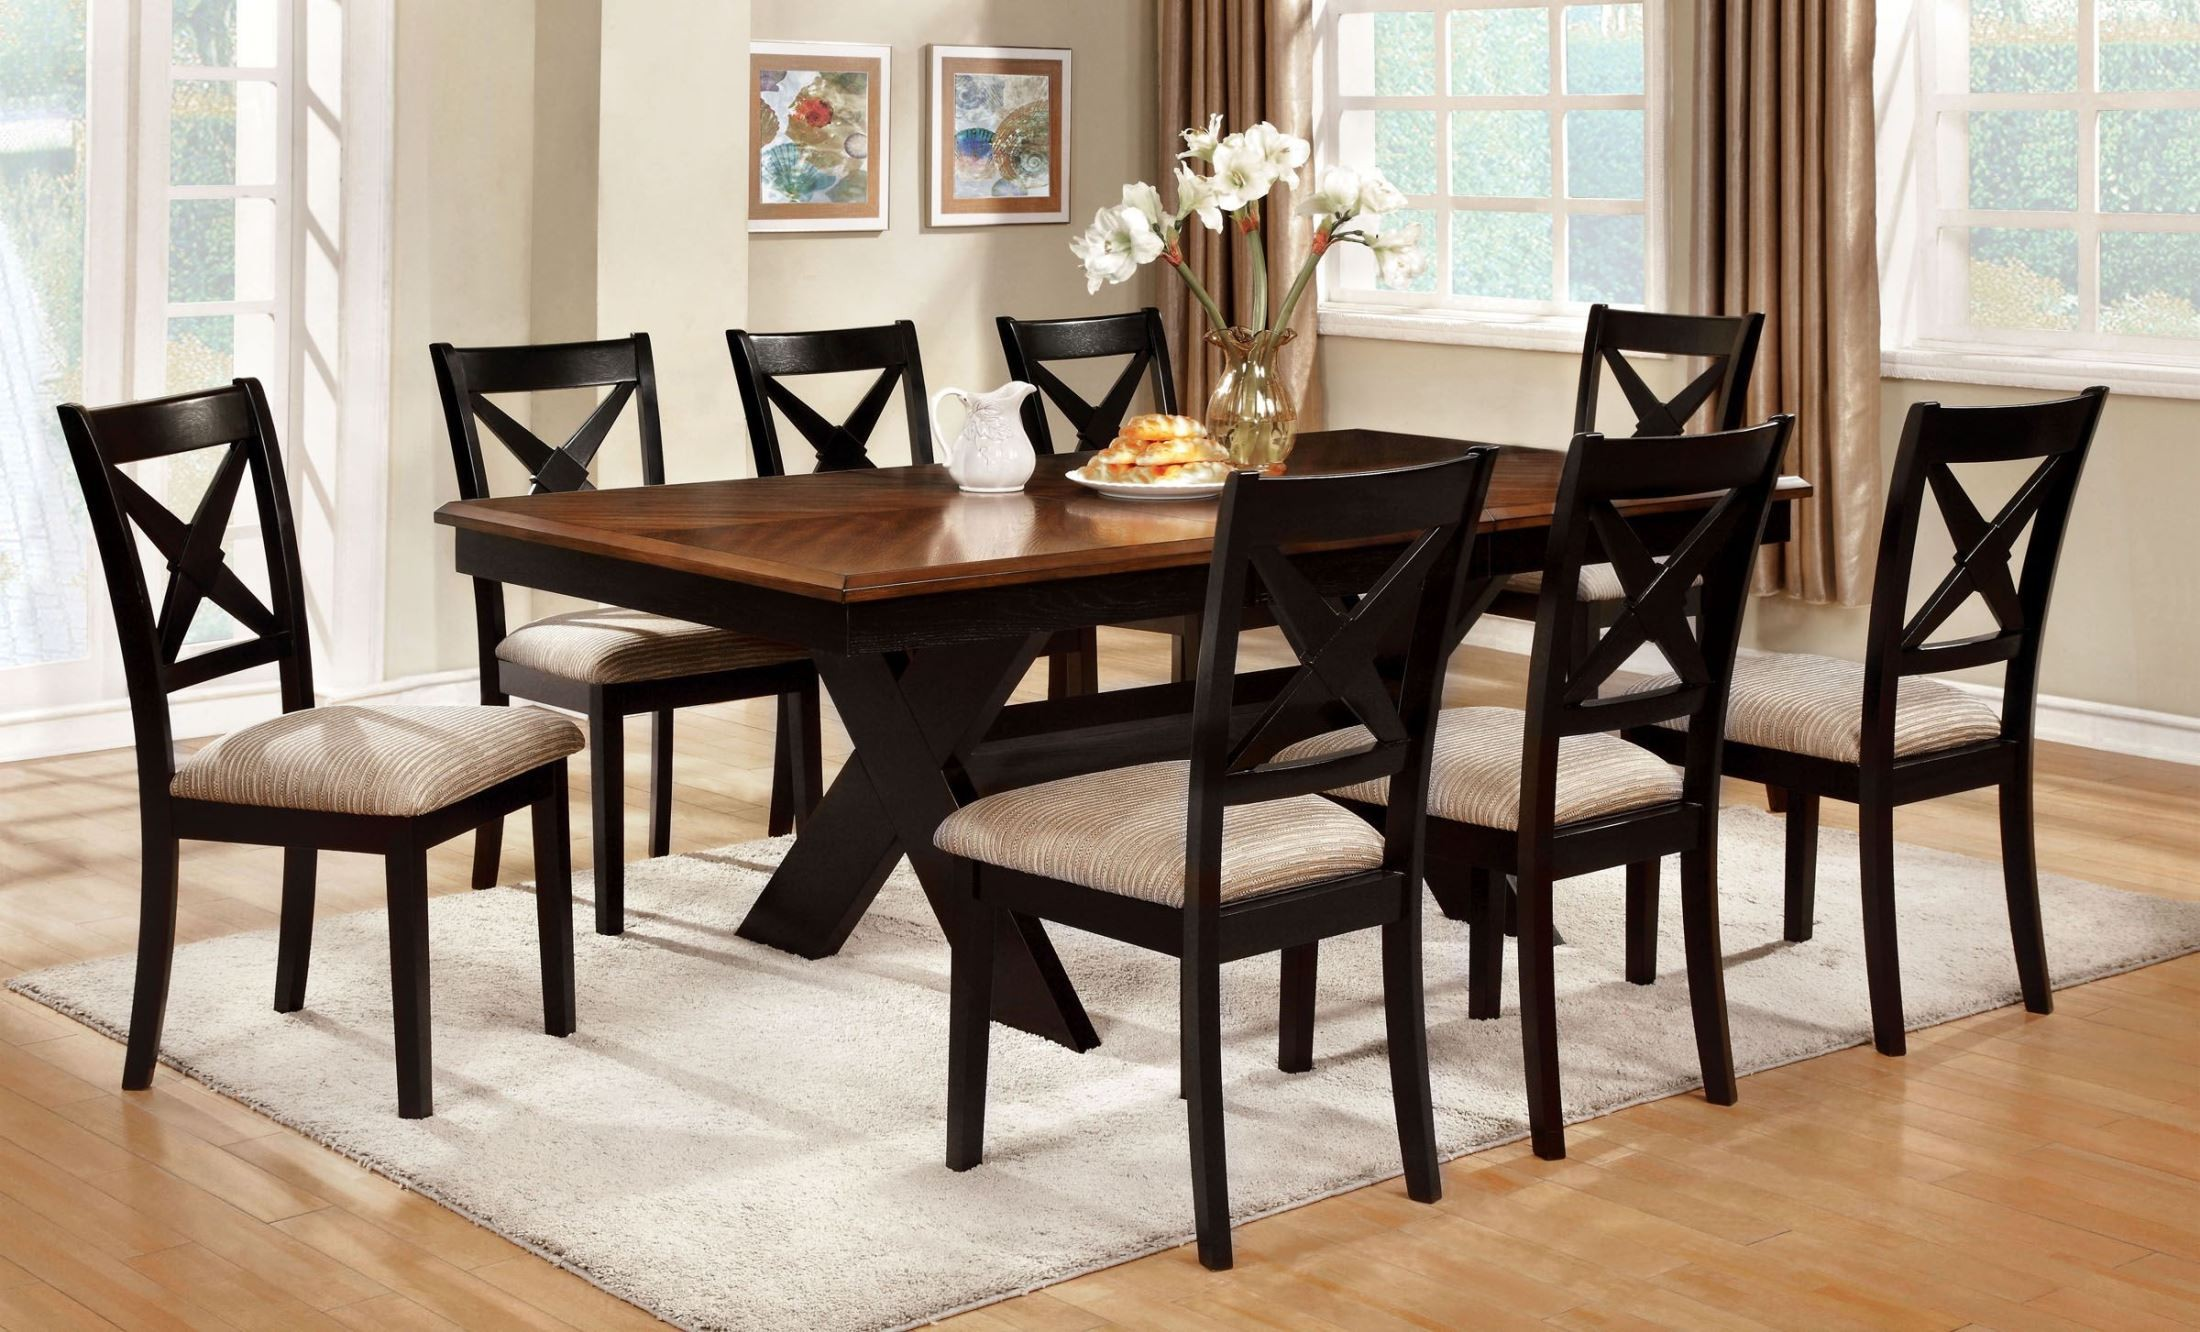 trestle dining room tables   Liberta Dark Oak Rectangular Trestle Dining Room Set ...